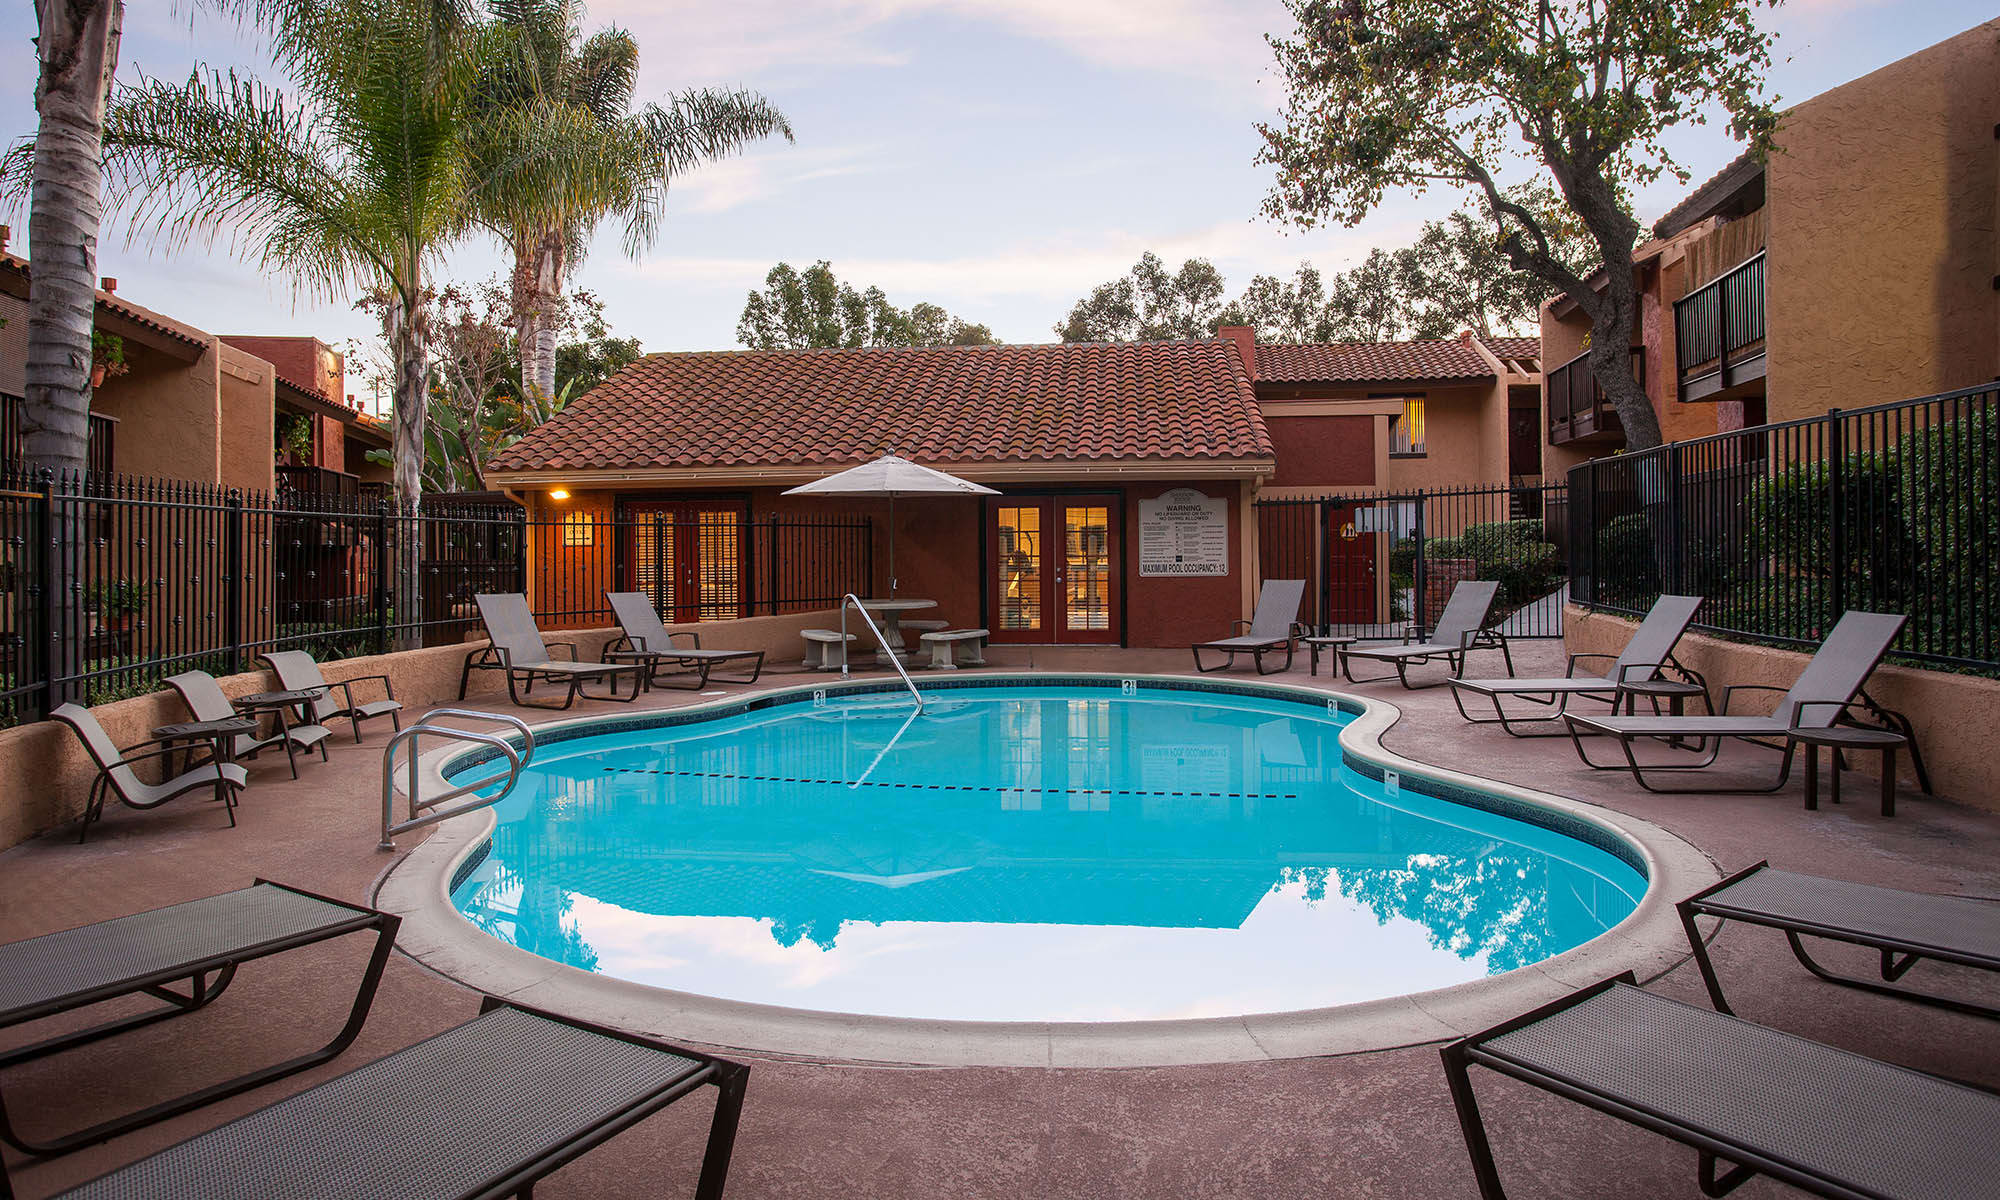 Apartments in Oceanside, CA